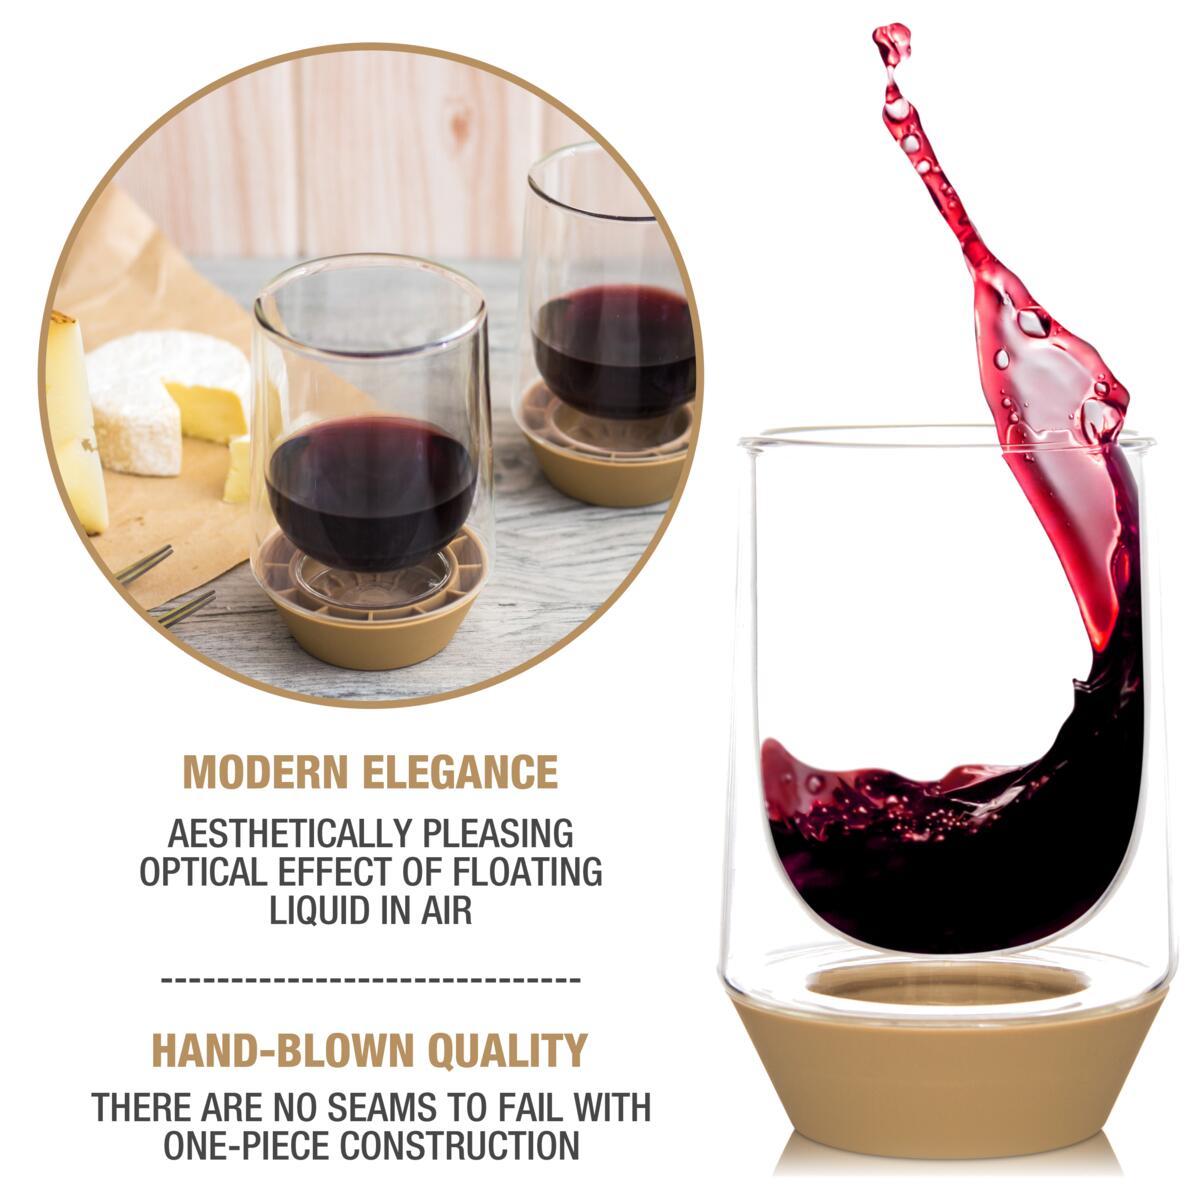 Eparé Wine Glass Set (Everyday Collection)